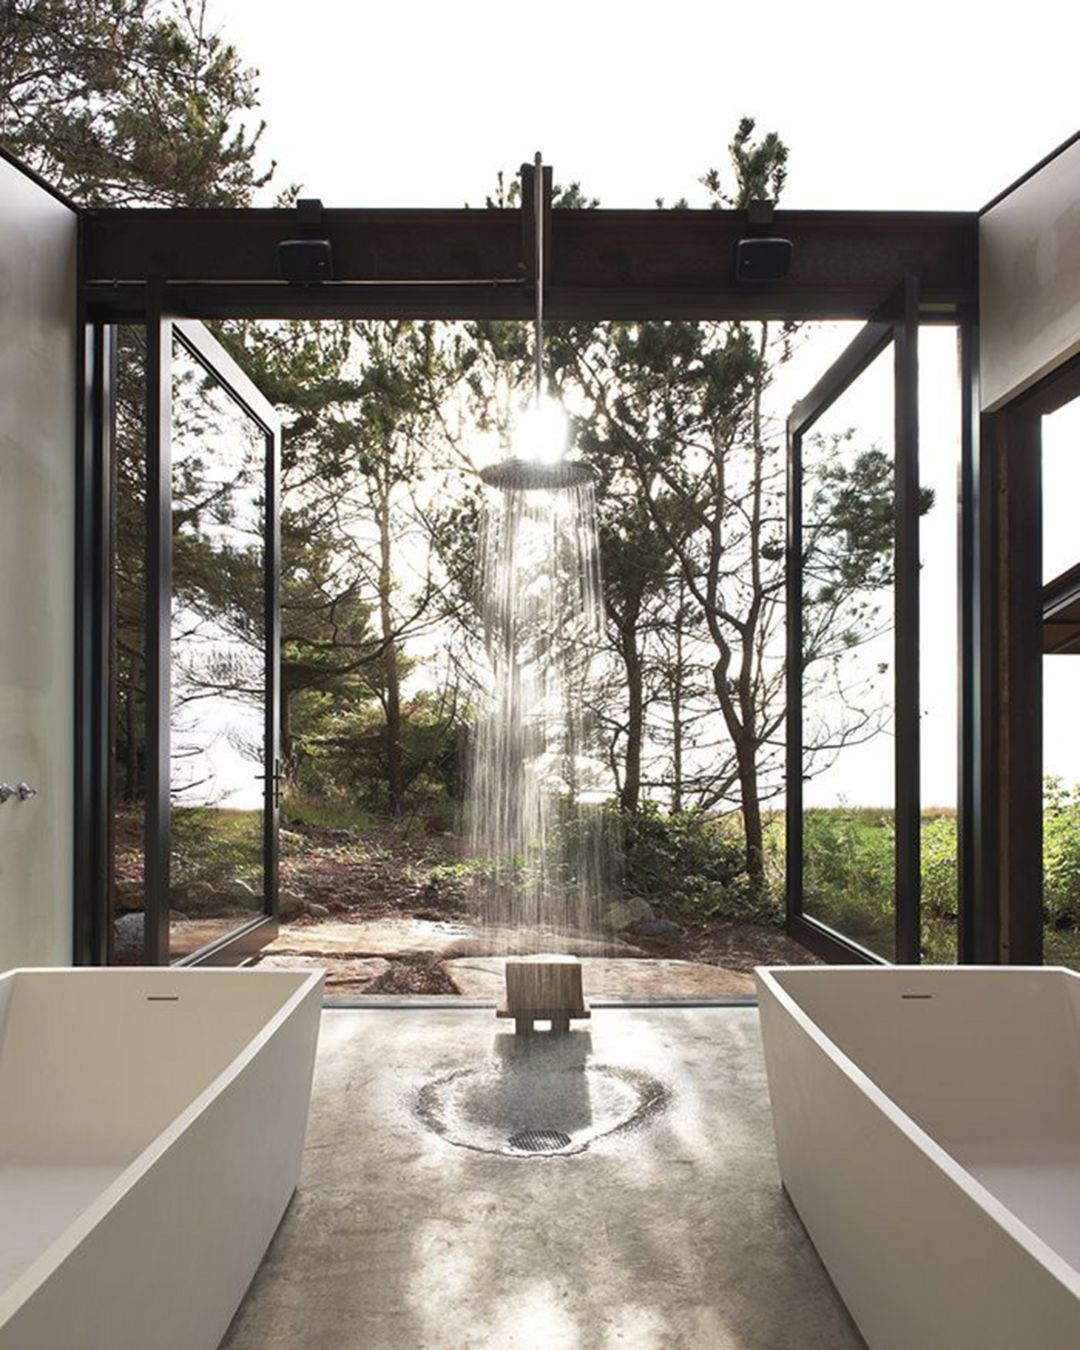 8 Amazing Outdoor Bathroom Design Idea That You Can Imitate Bathroomdesigns Bathroomideas In 2020 Outdoor Bathroom Design Indoor Outdoor Bathroom Outdoor Bathrooms